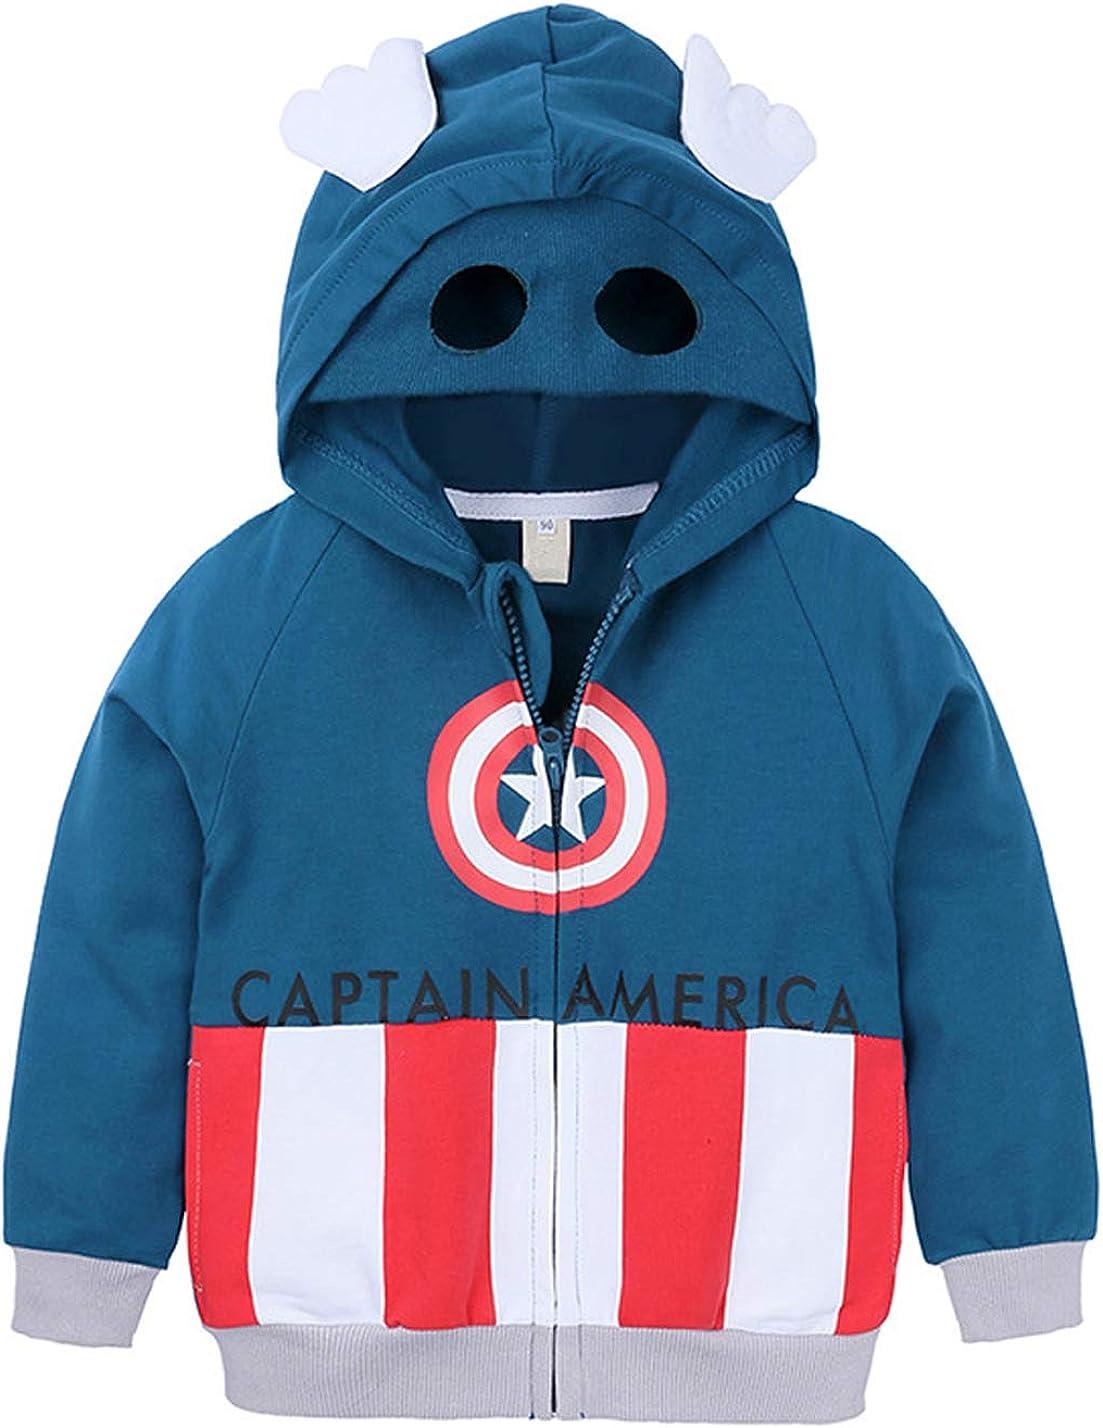 Symunnia Toddler Kids Baby Boys Clothes Spring Autumn Long Sleeve Cartoon Pullover Hoodie Sweatshirt